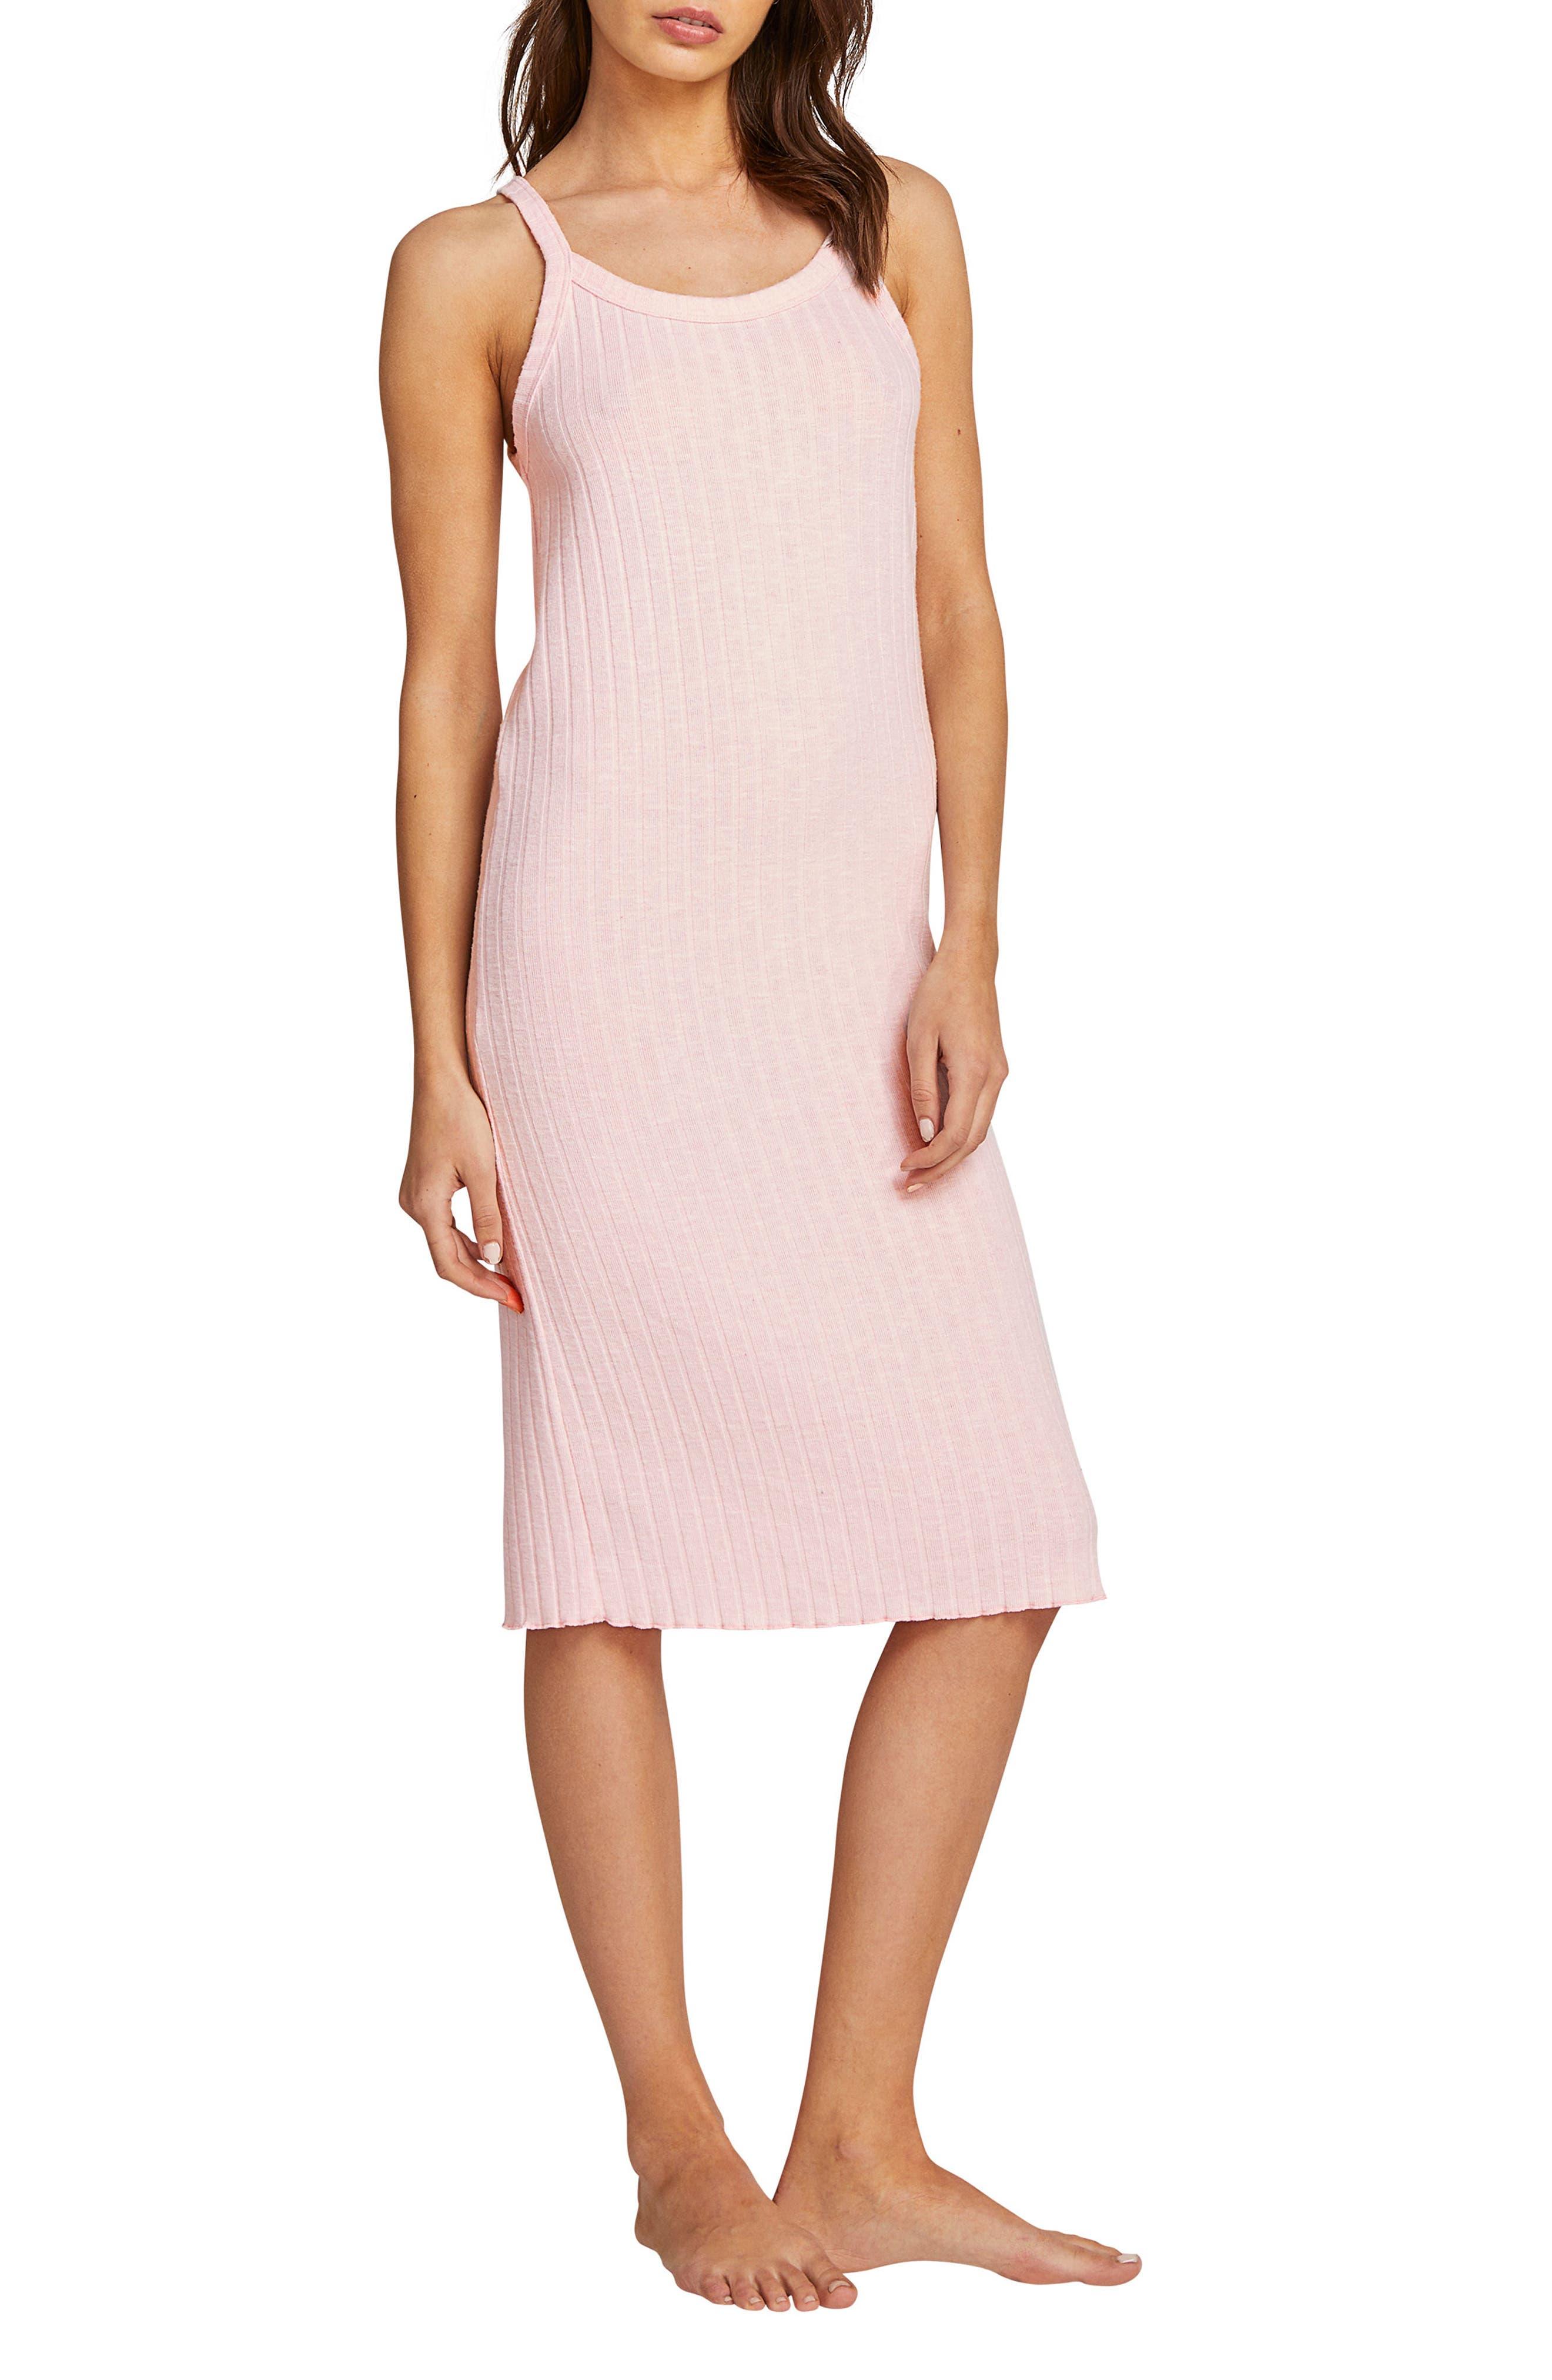 Volcom Lil Dress, Pink